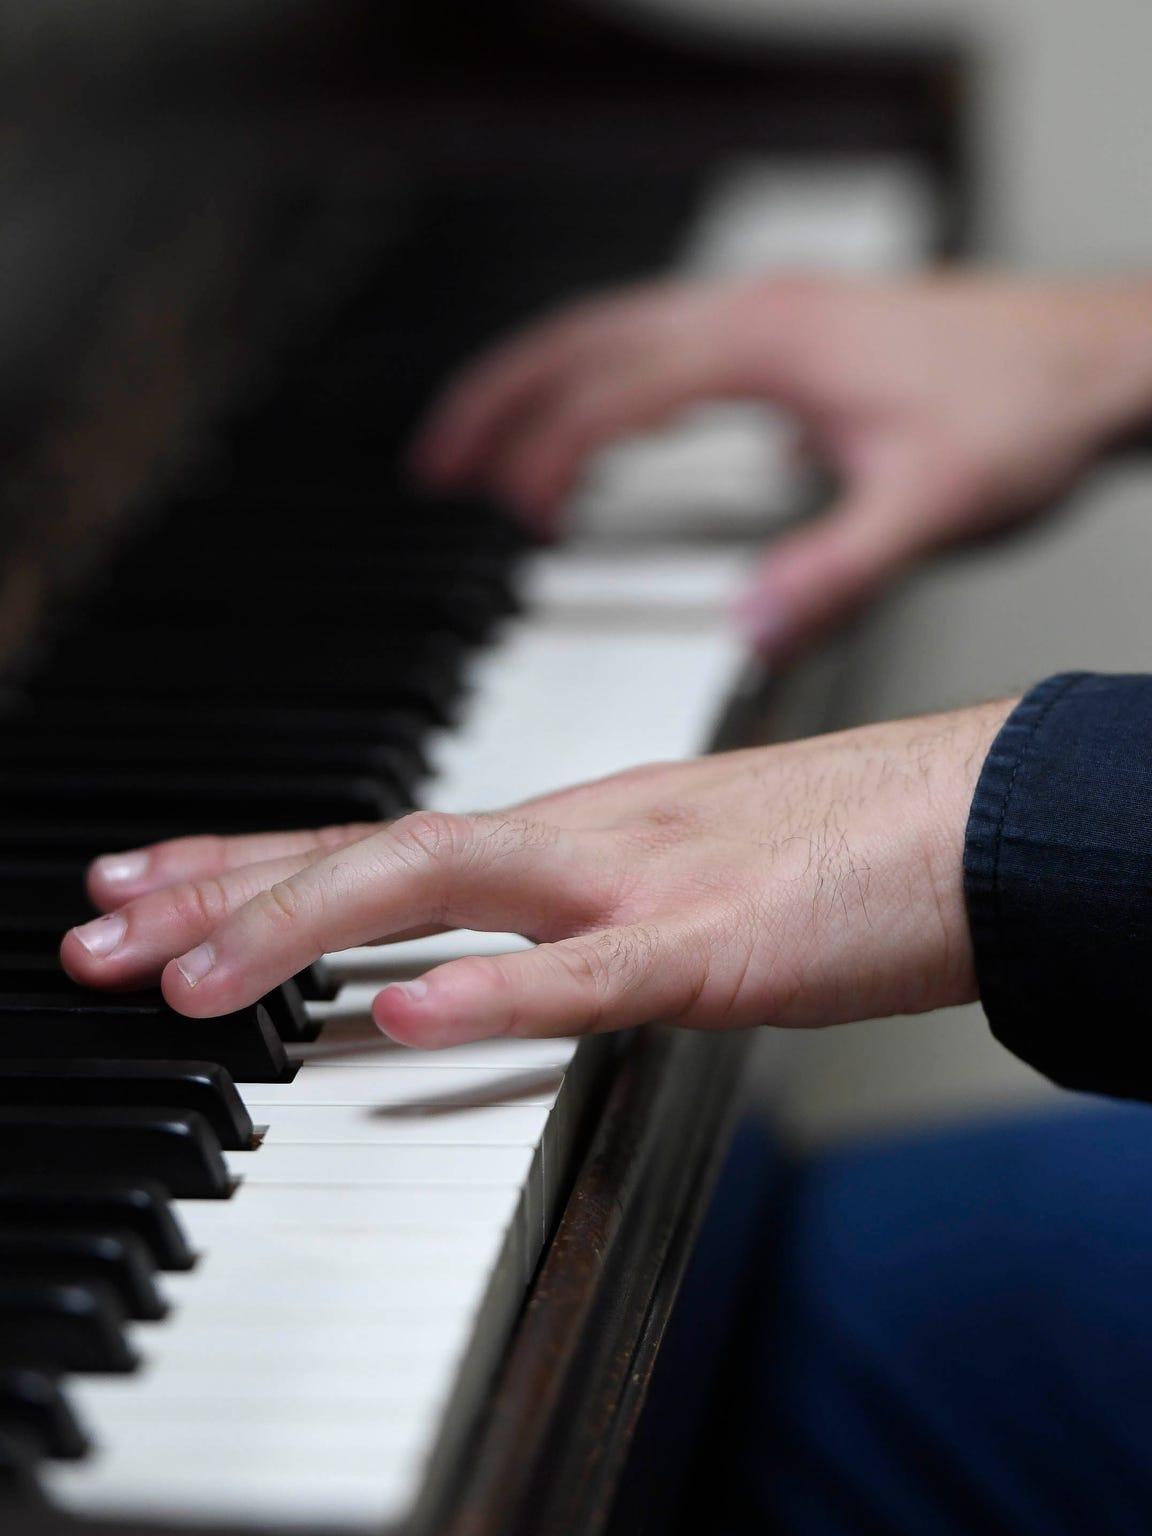 Fingers on the keys, Brazilian musician Rafael Pereida rehearses after work at the University of Evansville's Krannert Hall of Fine Arts Thursday, May 25, 2017.